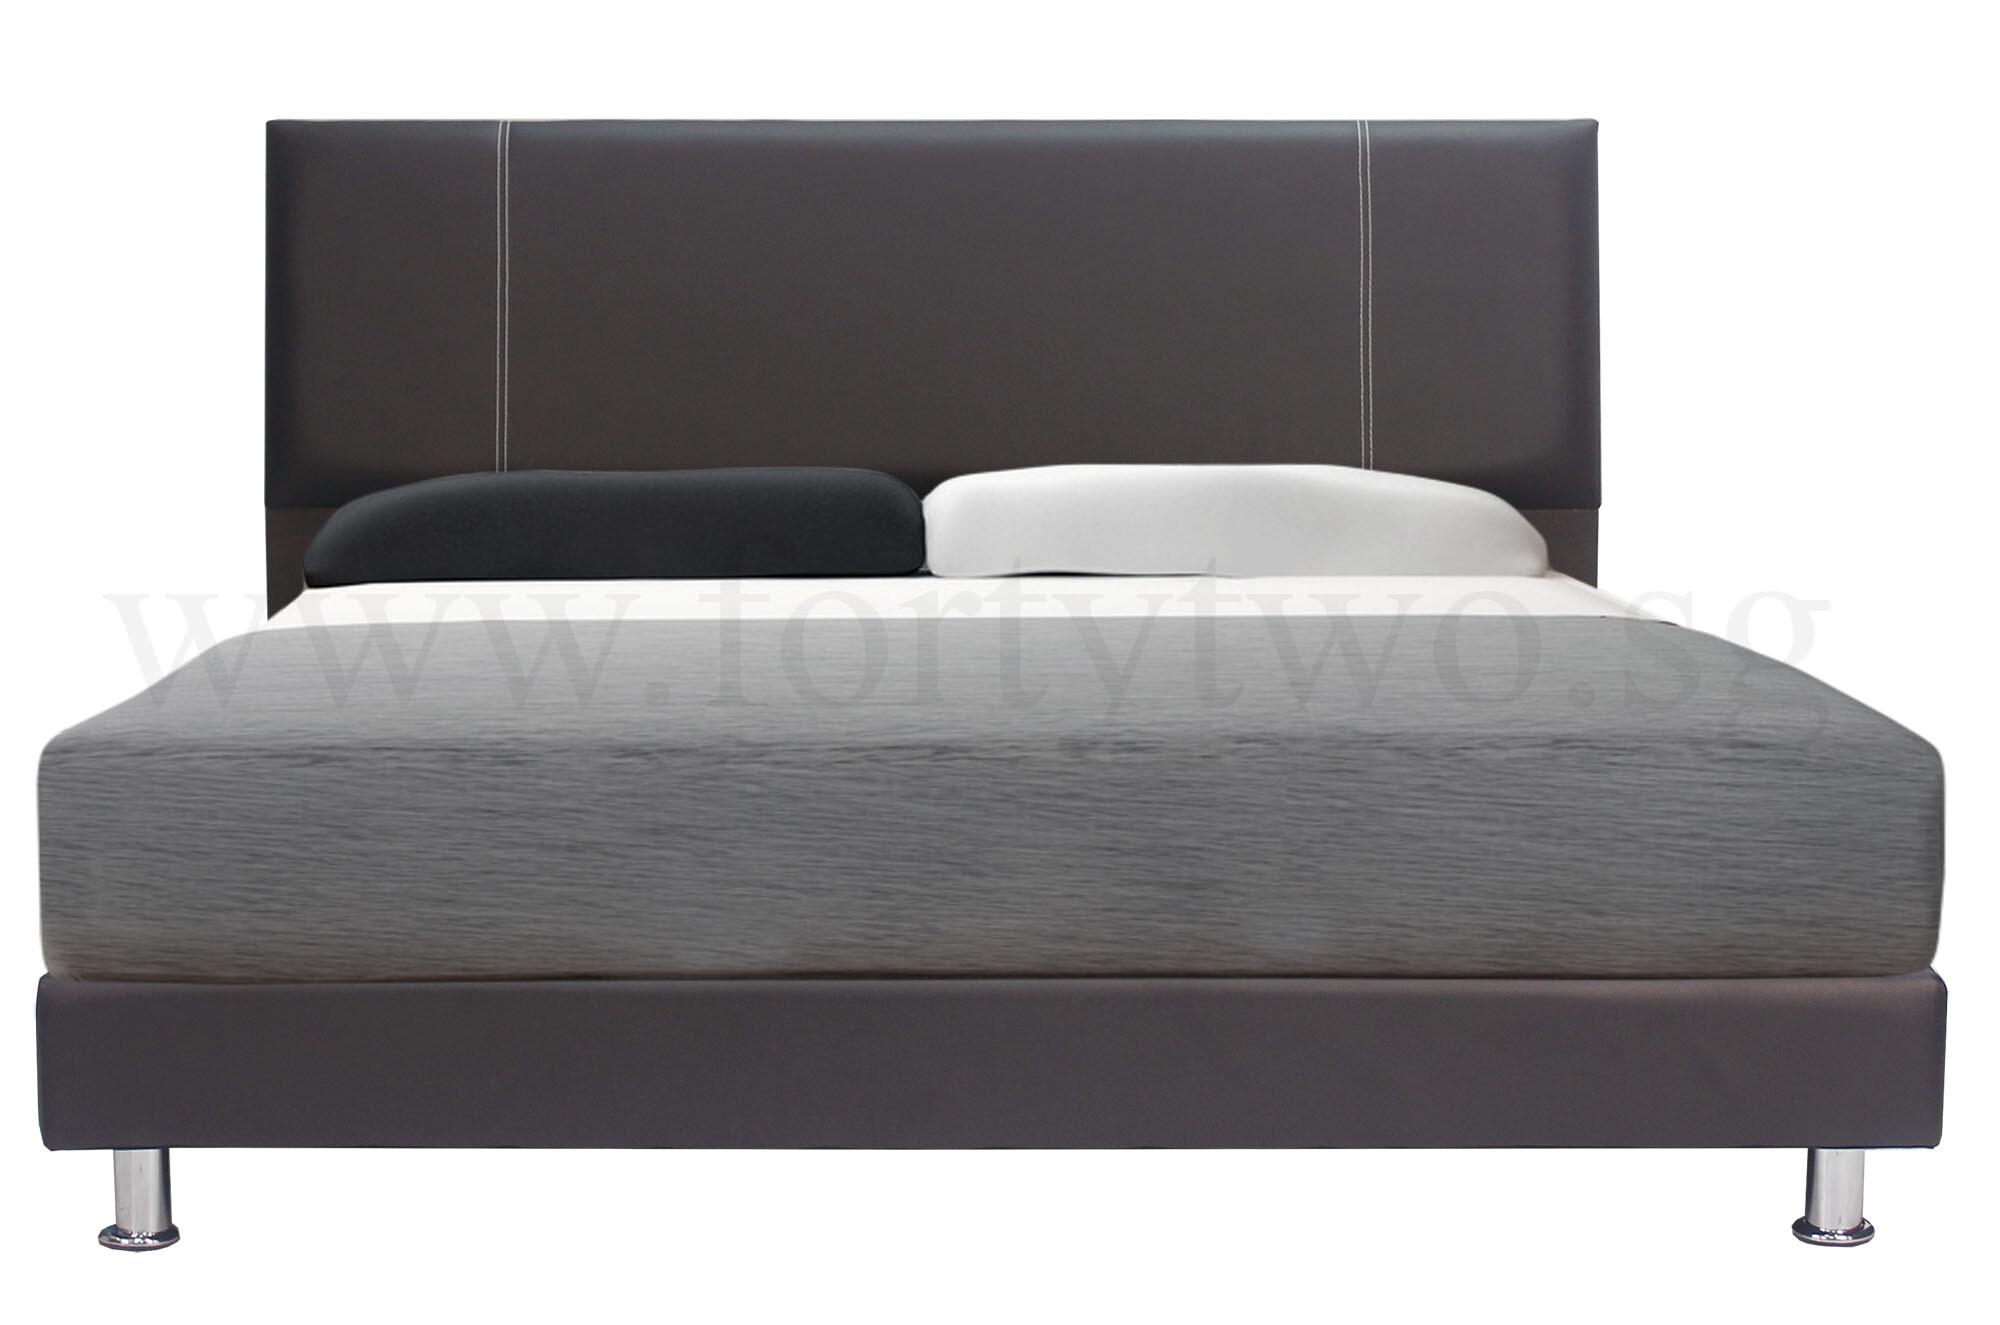 Bellamy 5 Piece Bedroom Set Furniture & Home Décor